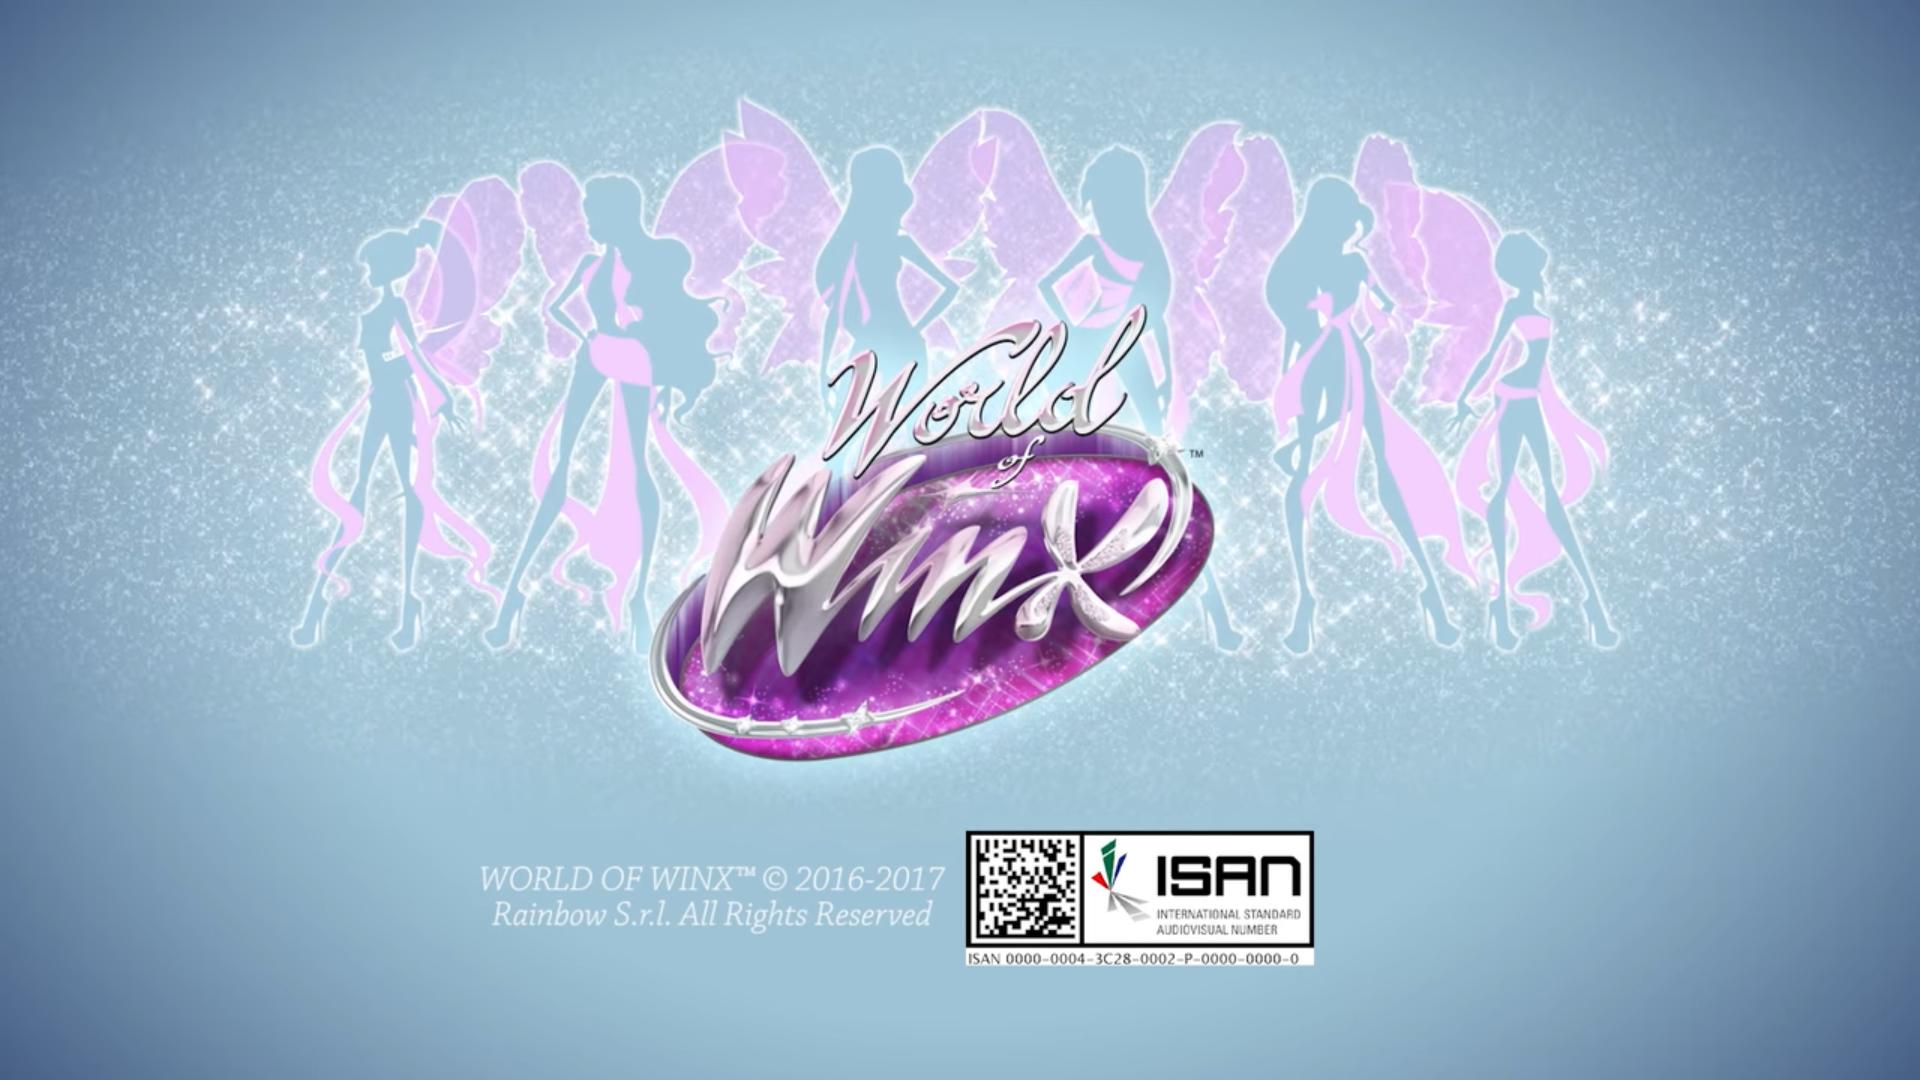 The Wonderful World of Winx